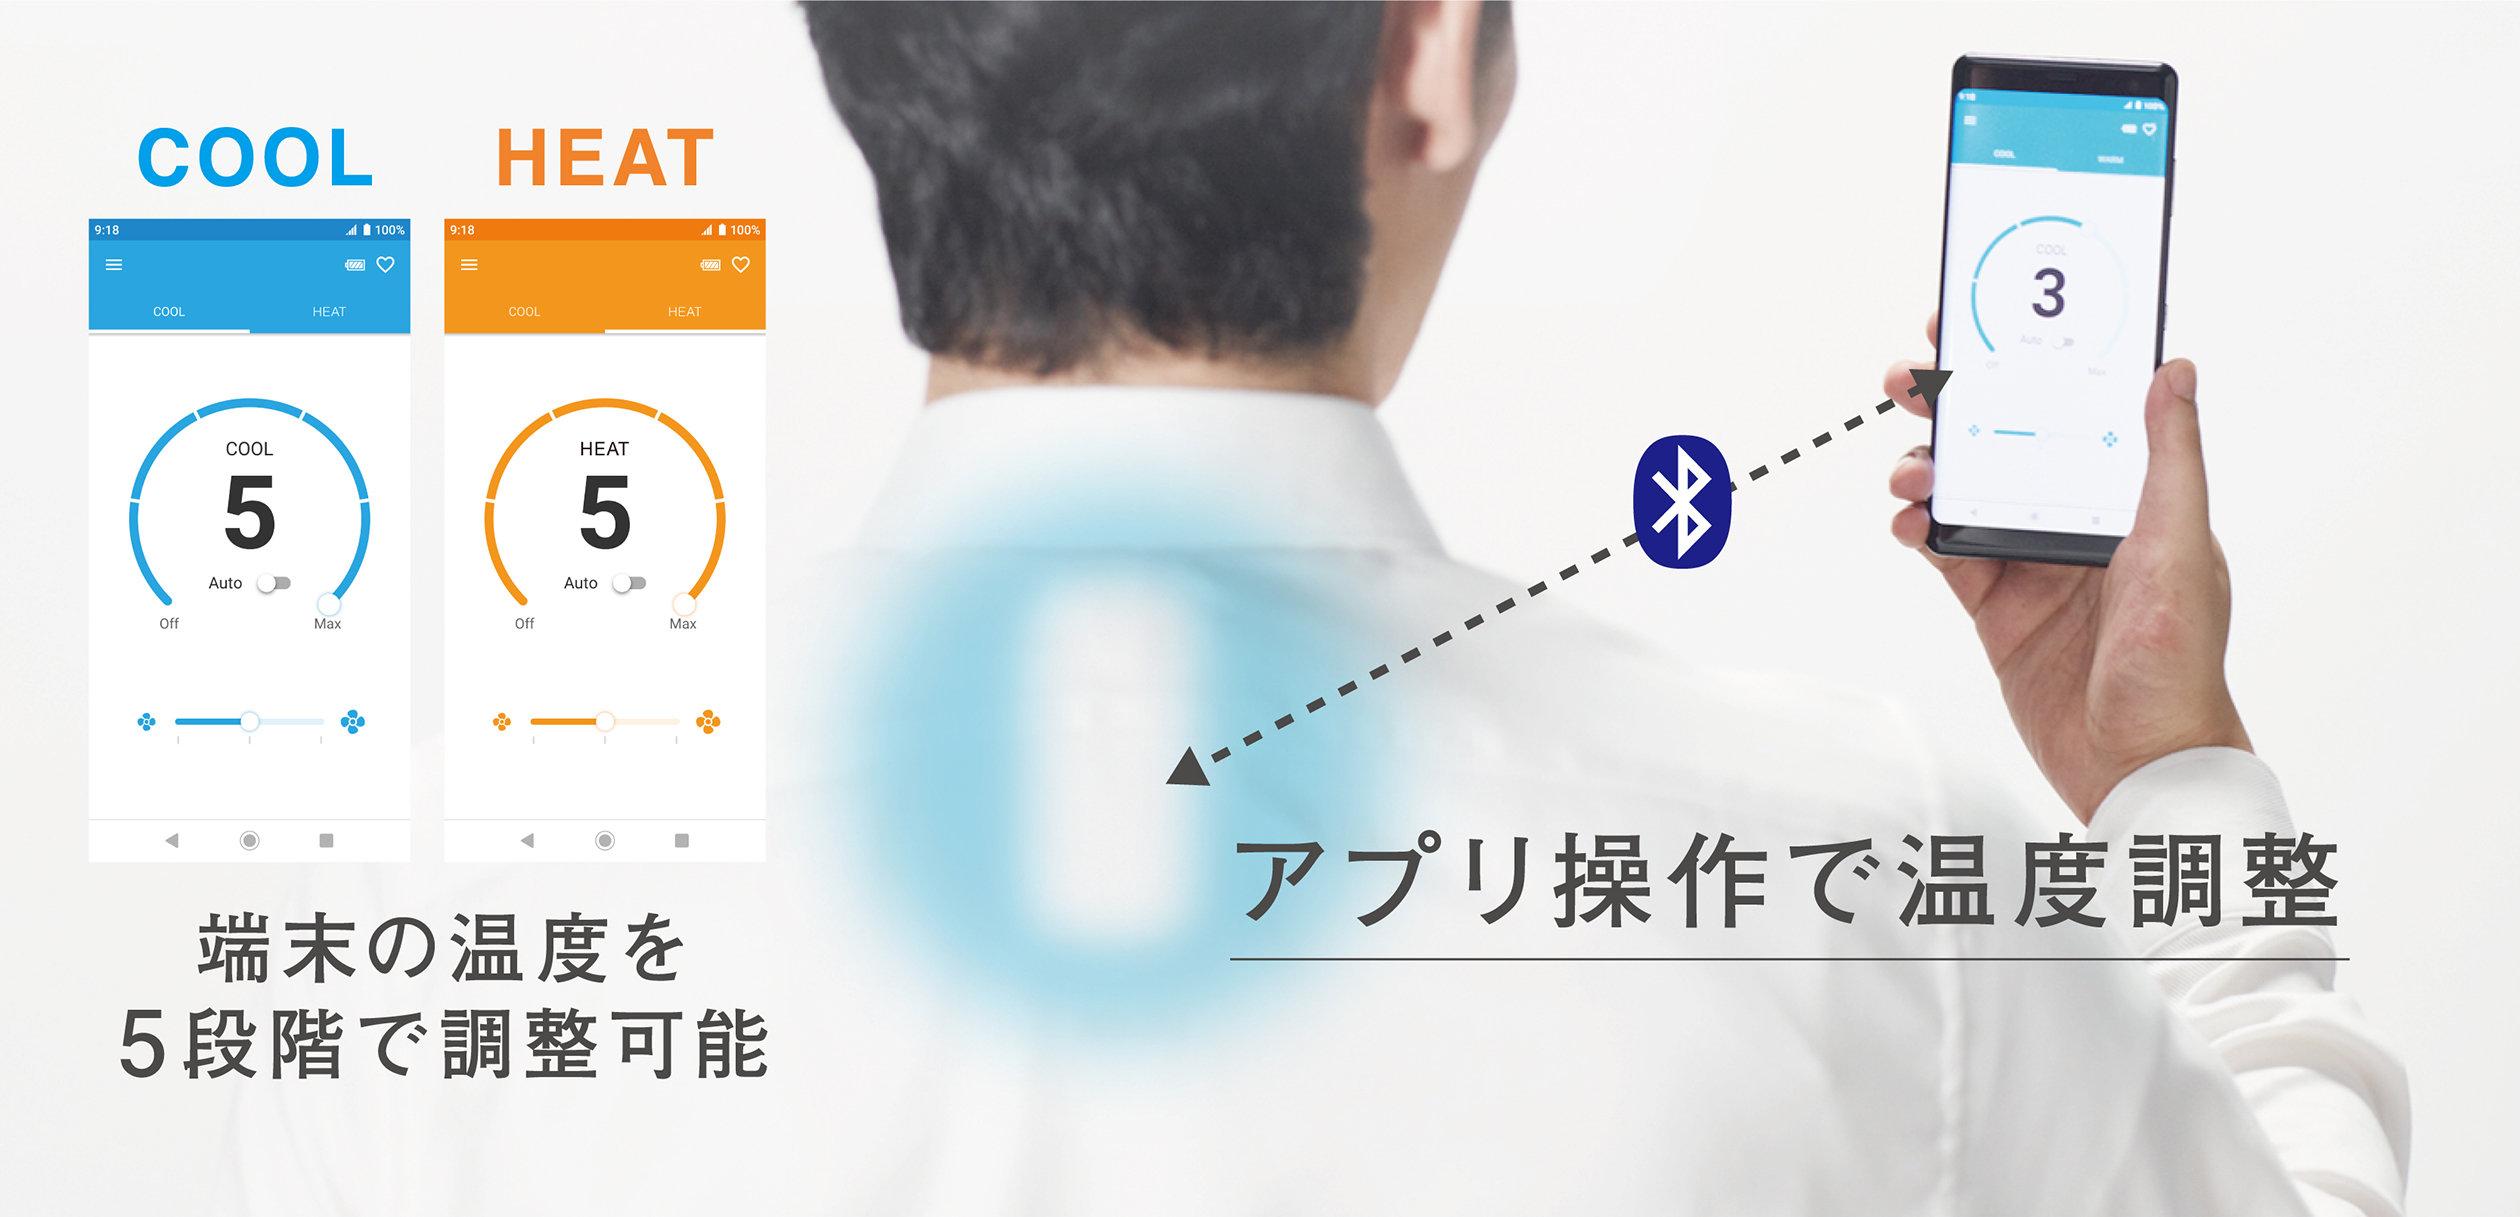 Sony 的「穿戴式空調」Reon Pocket 集資中!能降溫 13 度防熱浪,天氣寒冷還可當暖爐